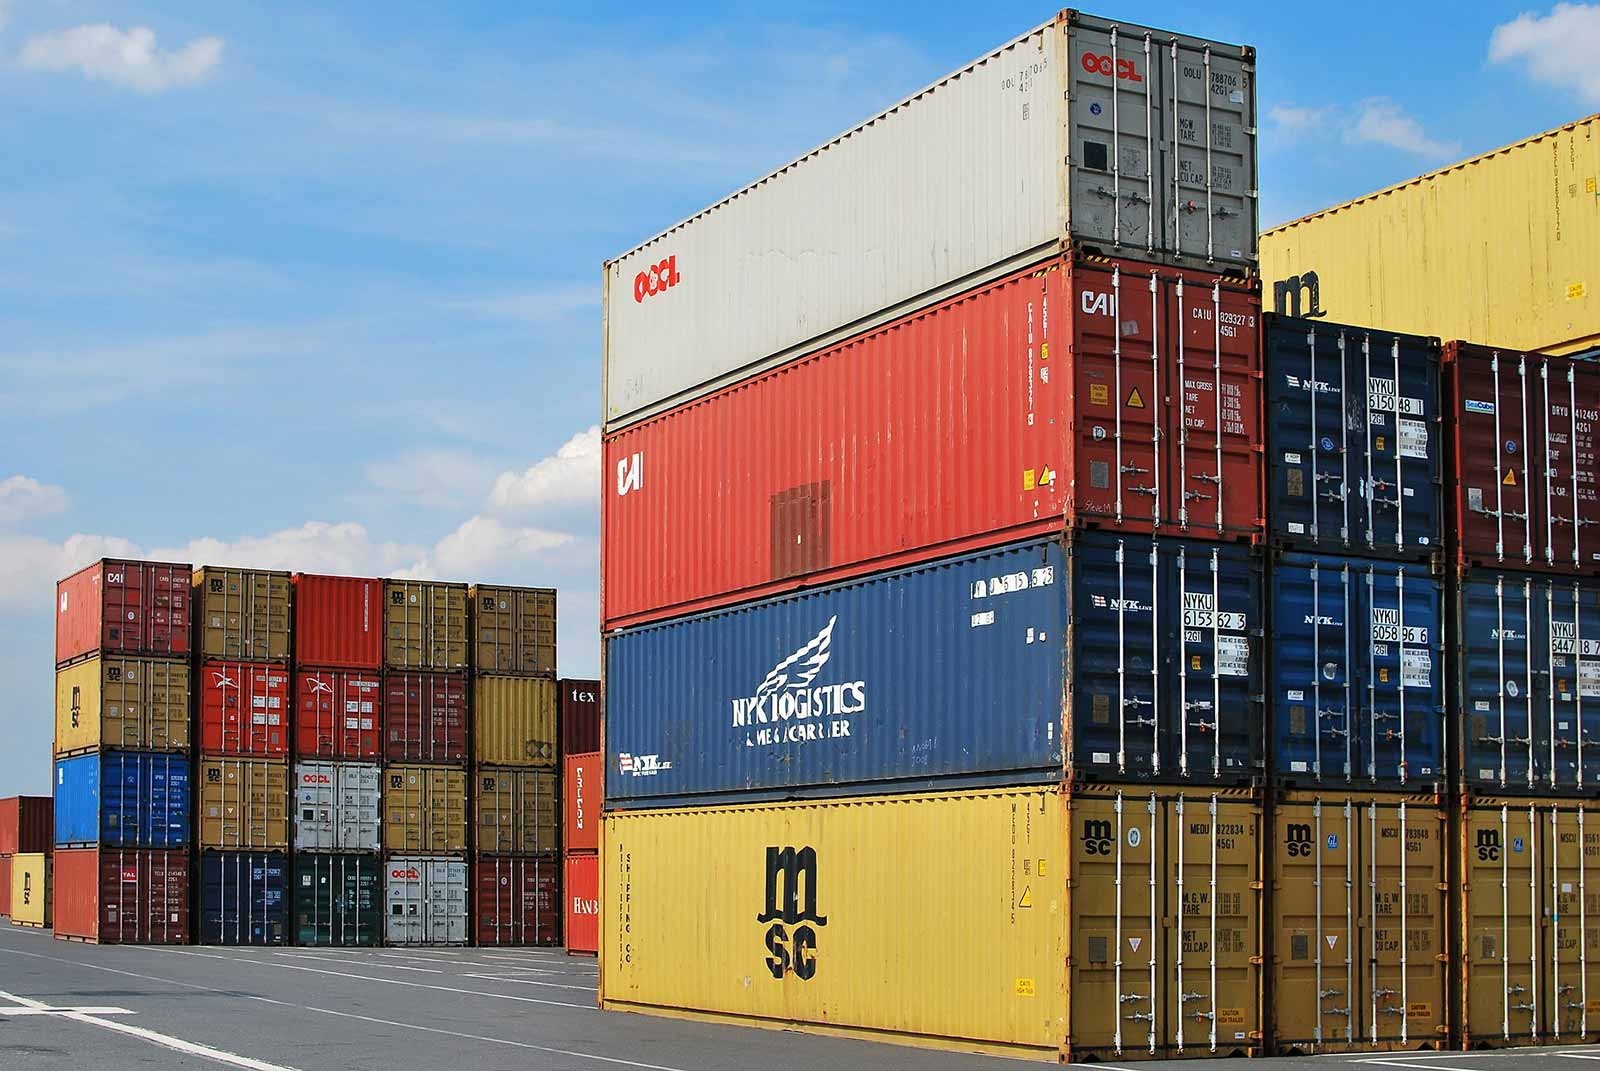 SEA FREIGHT | Global Corporate Logistics | FCL, LCL, Breakbulk Cargo